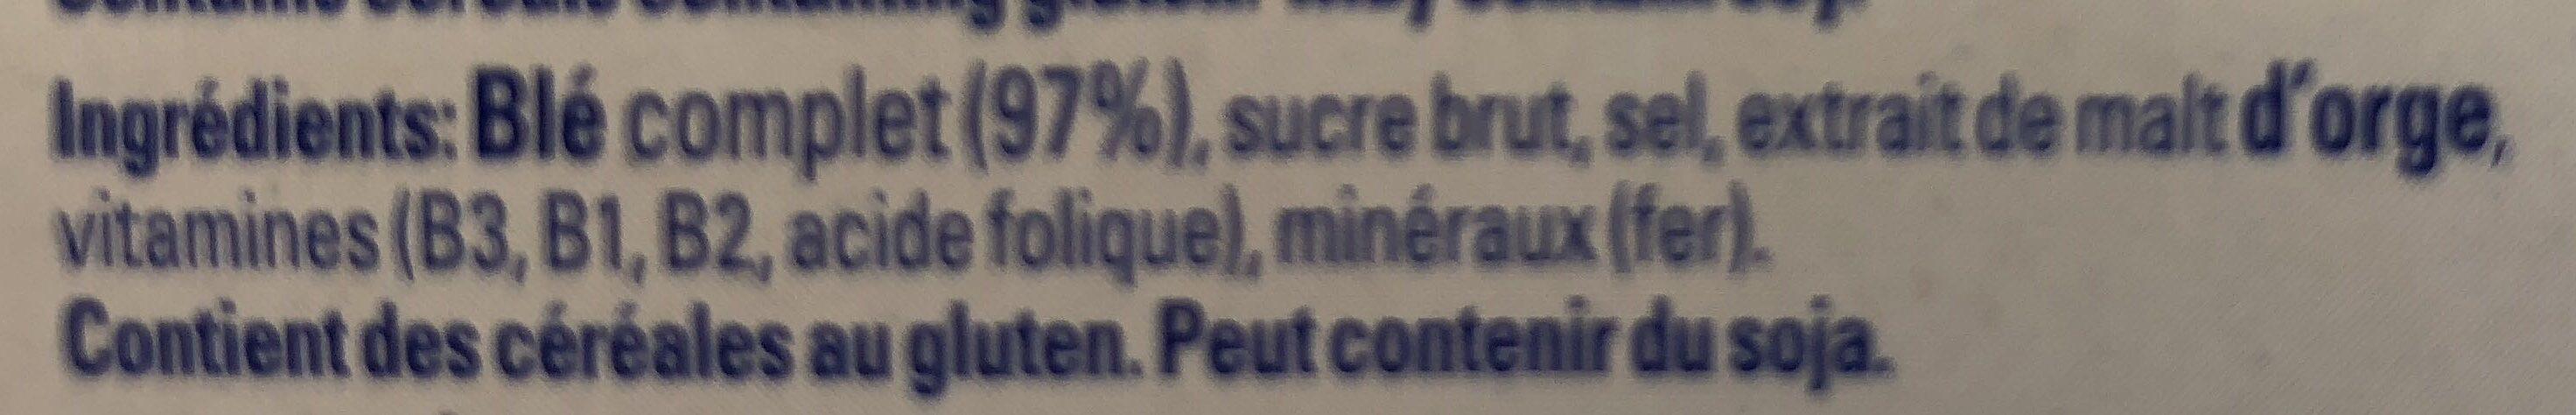 Weet-bix - Ingrédients - fr